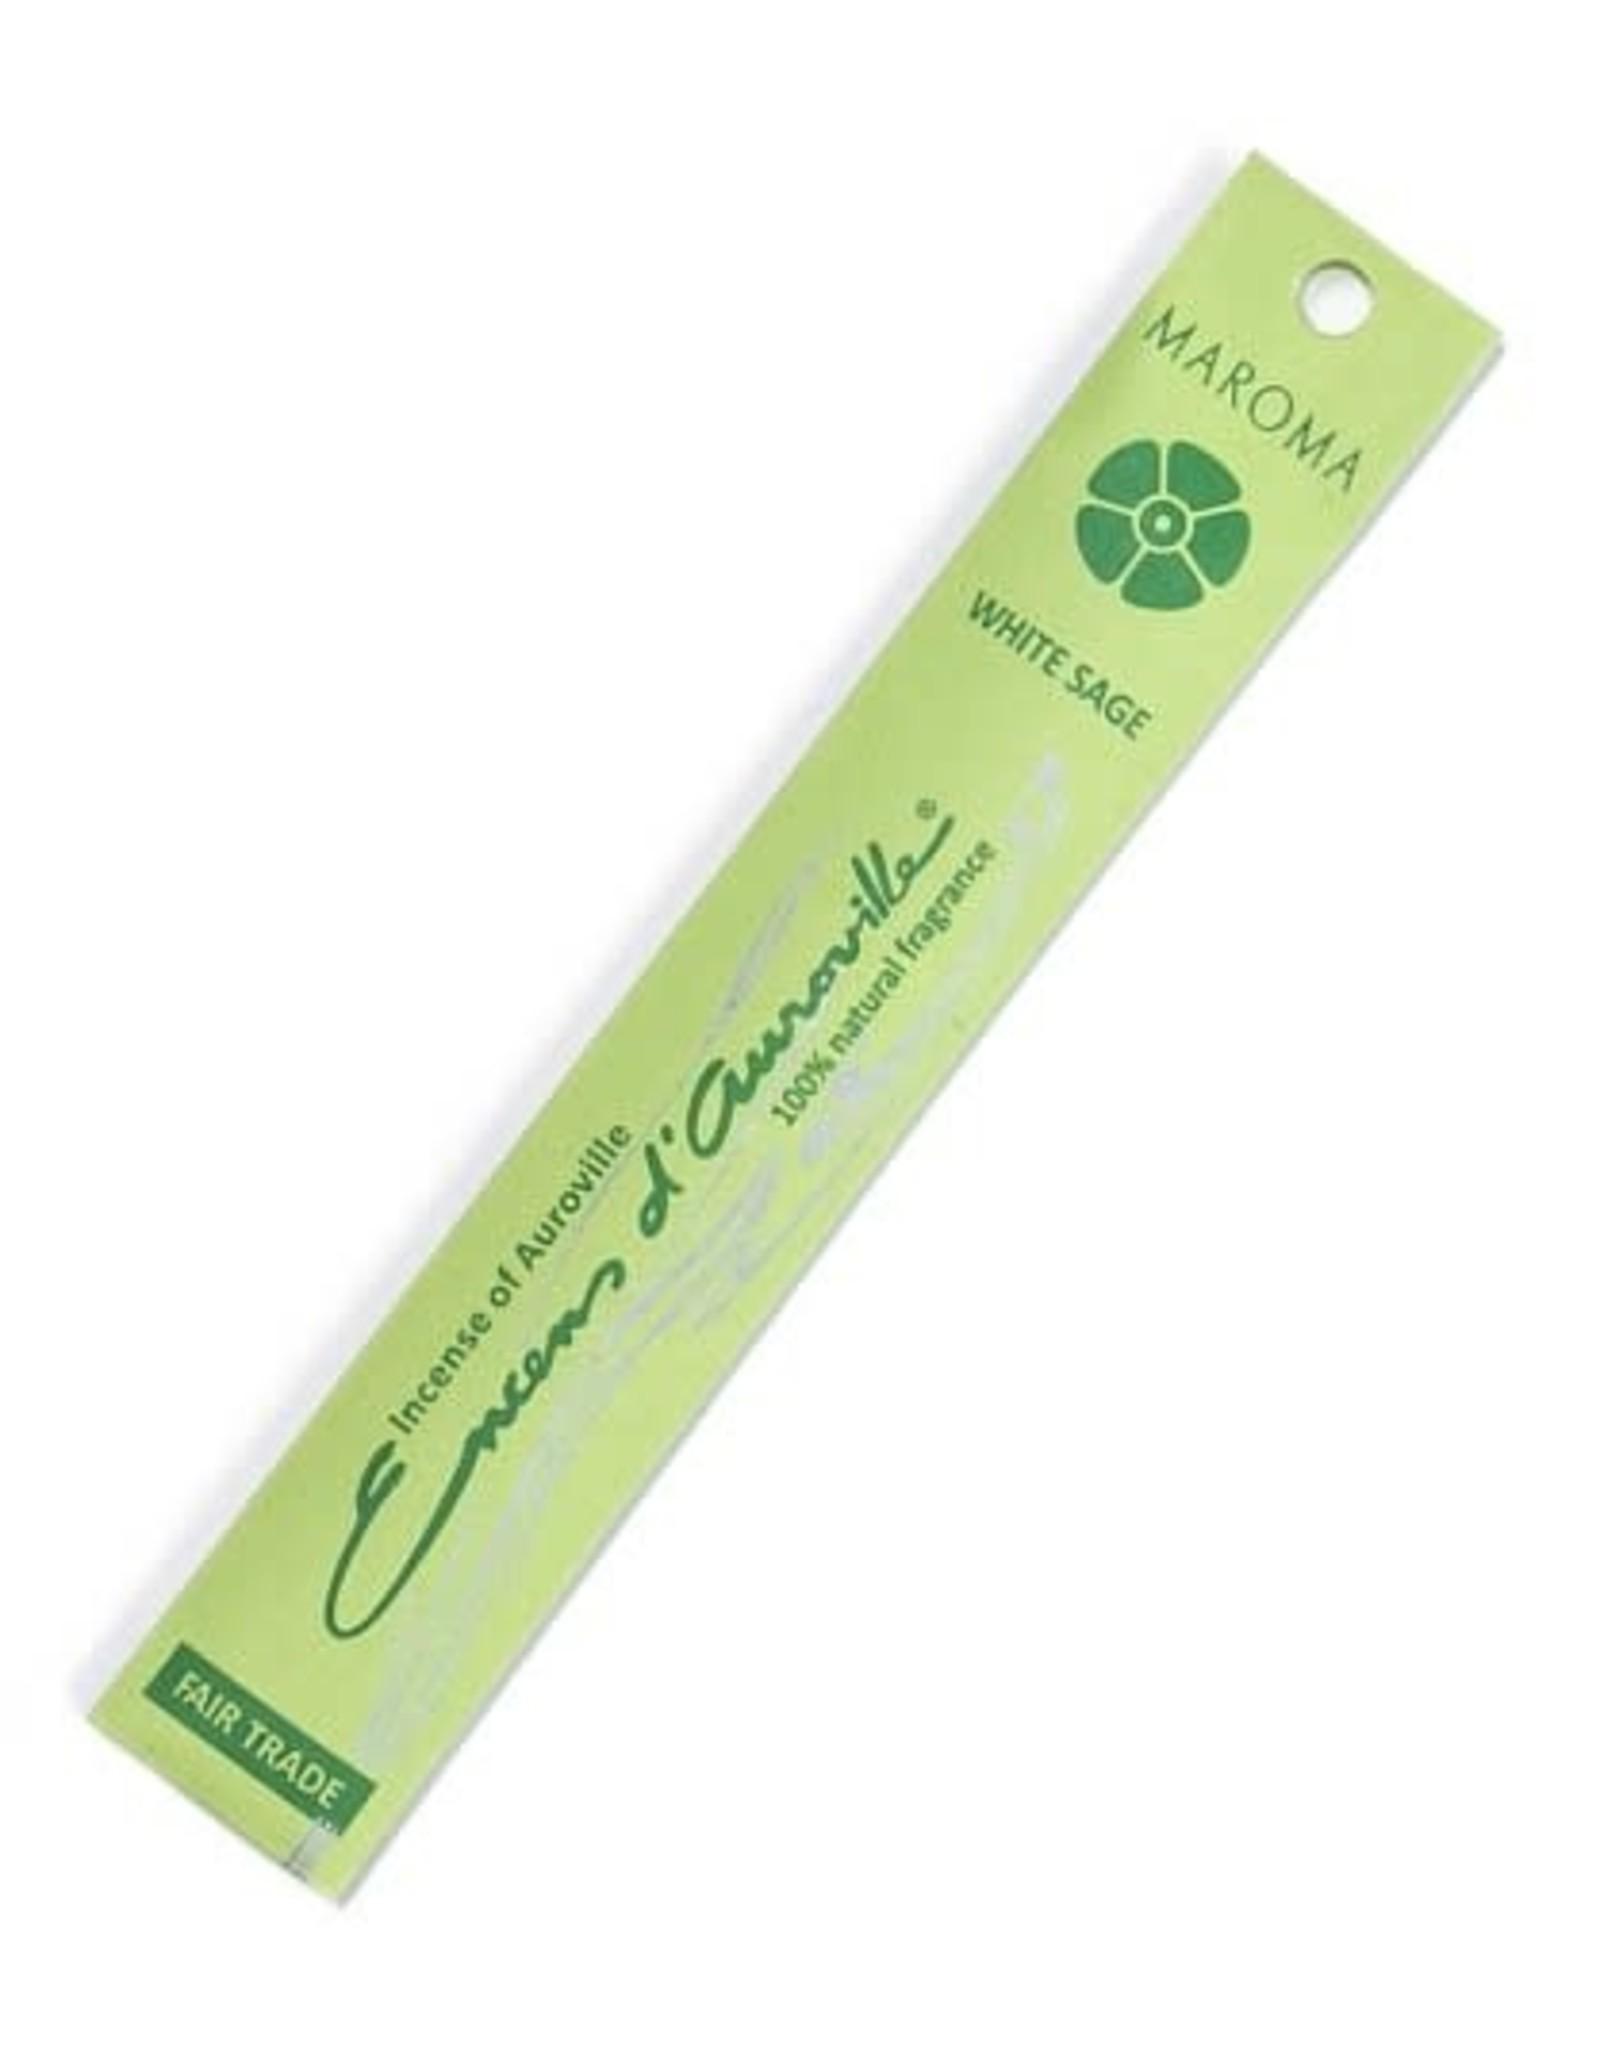 Stick Incense Sticks, White Sage, India